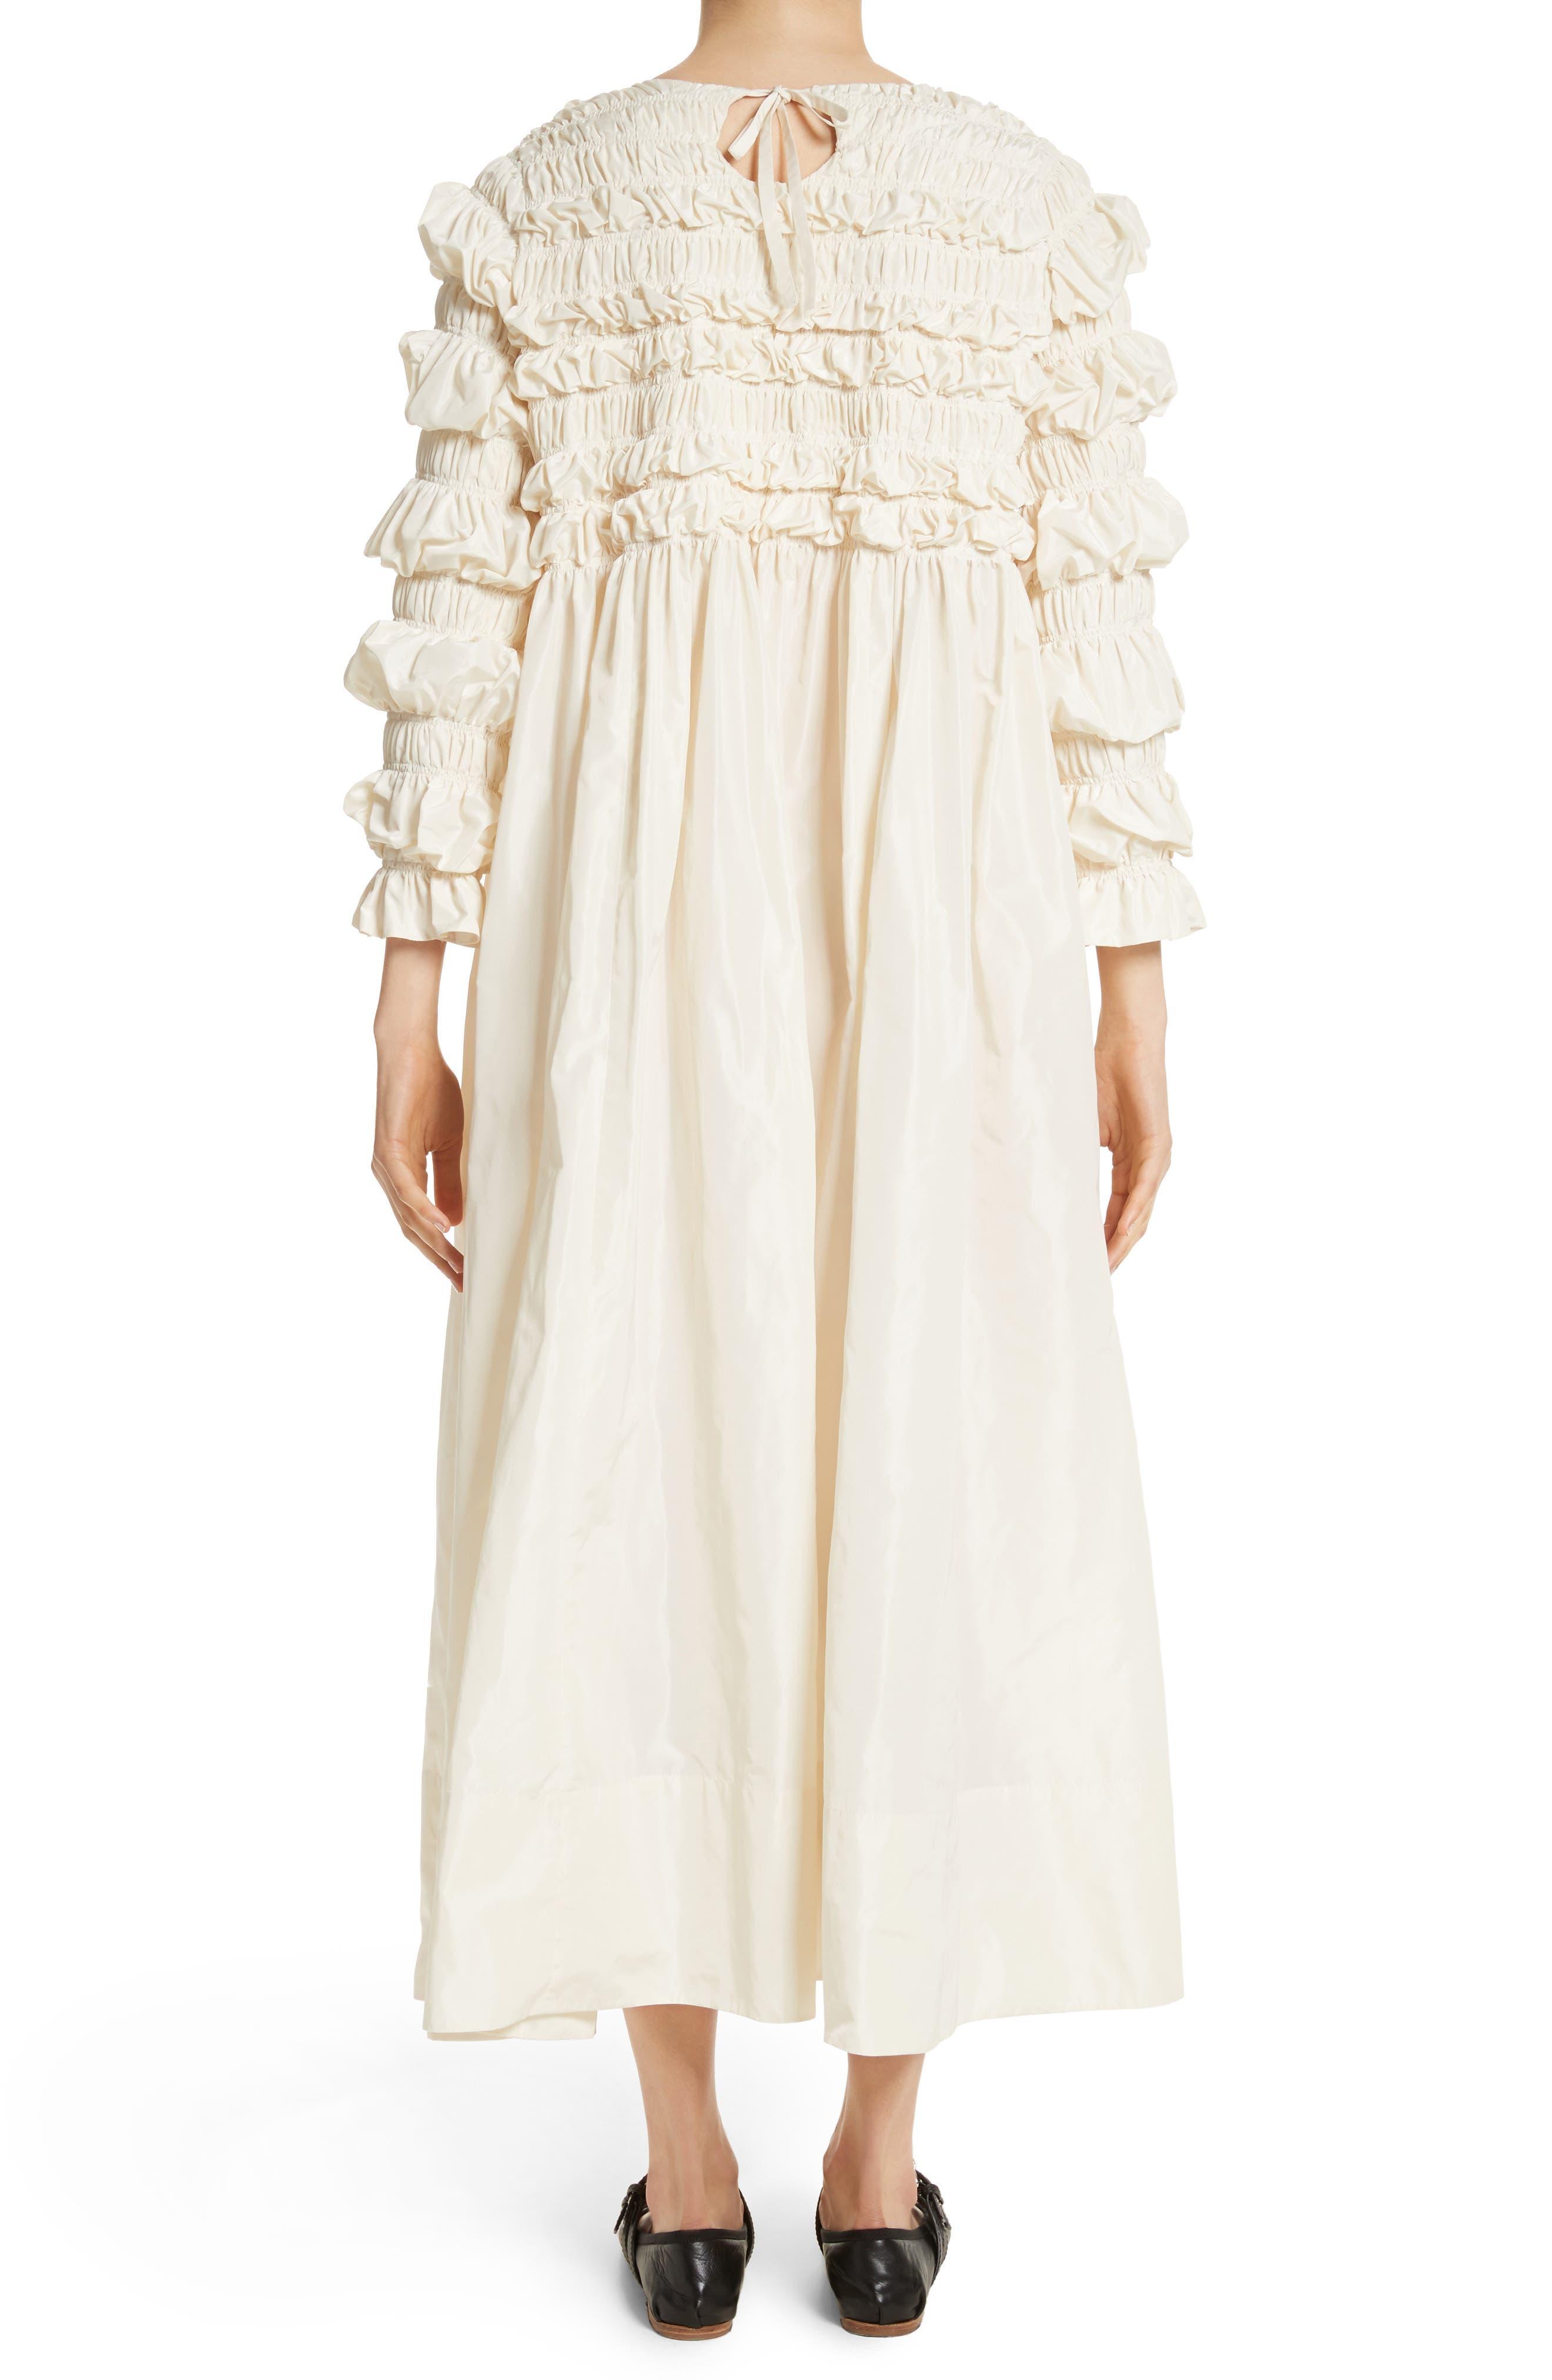 Lizzie Ruffled Taffeta Dress,                             Alternate thumbnail 2, color,                             900